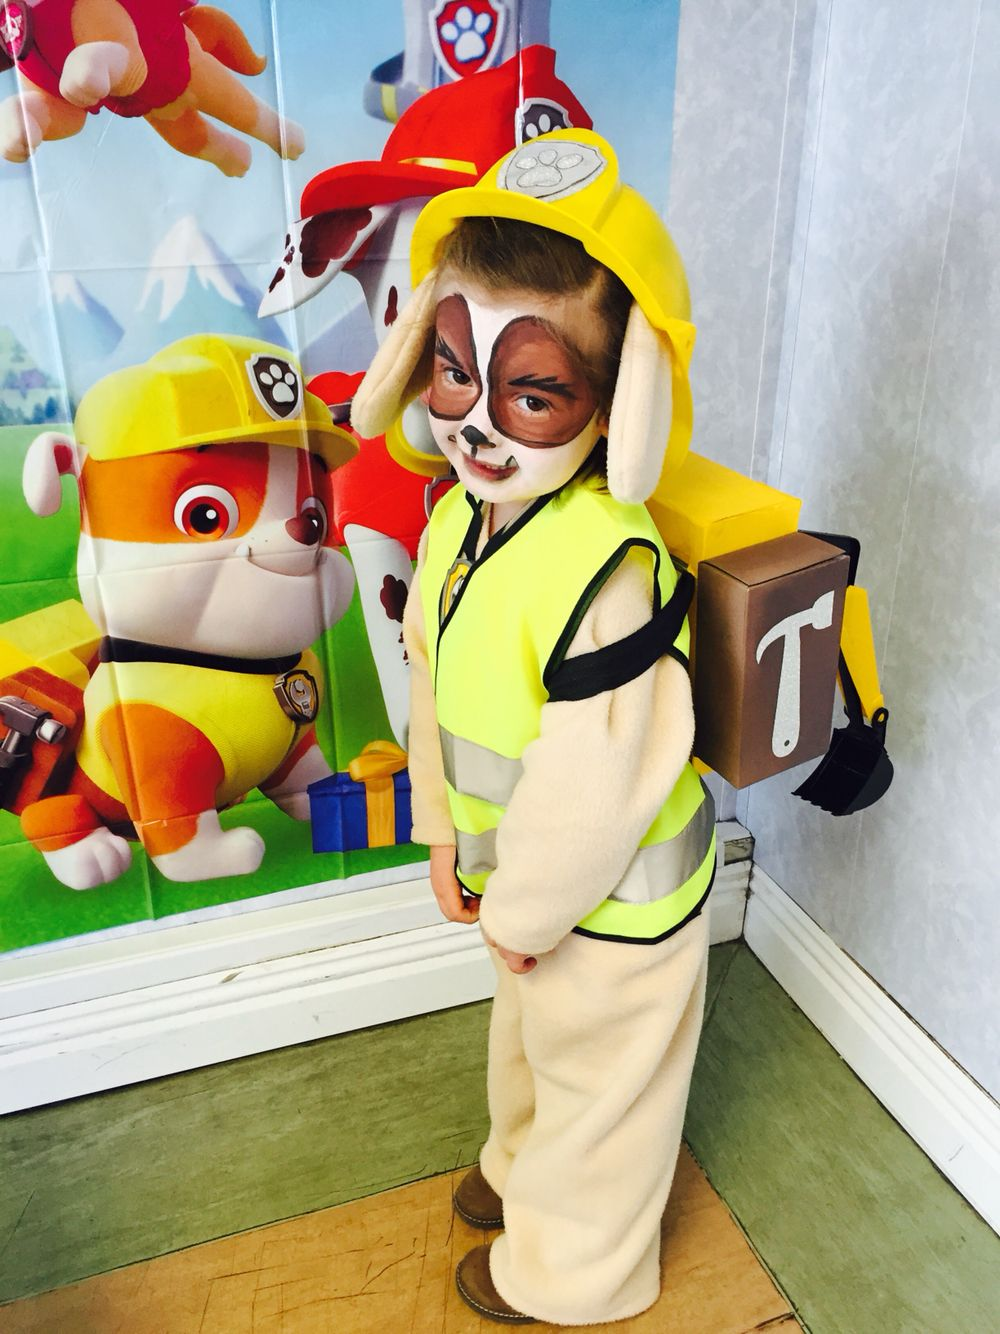 DIY Paw Patrol Rubble costume! More ca92906755